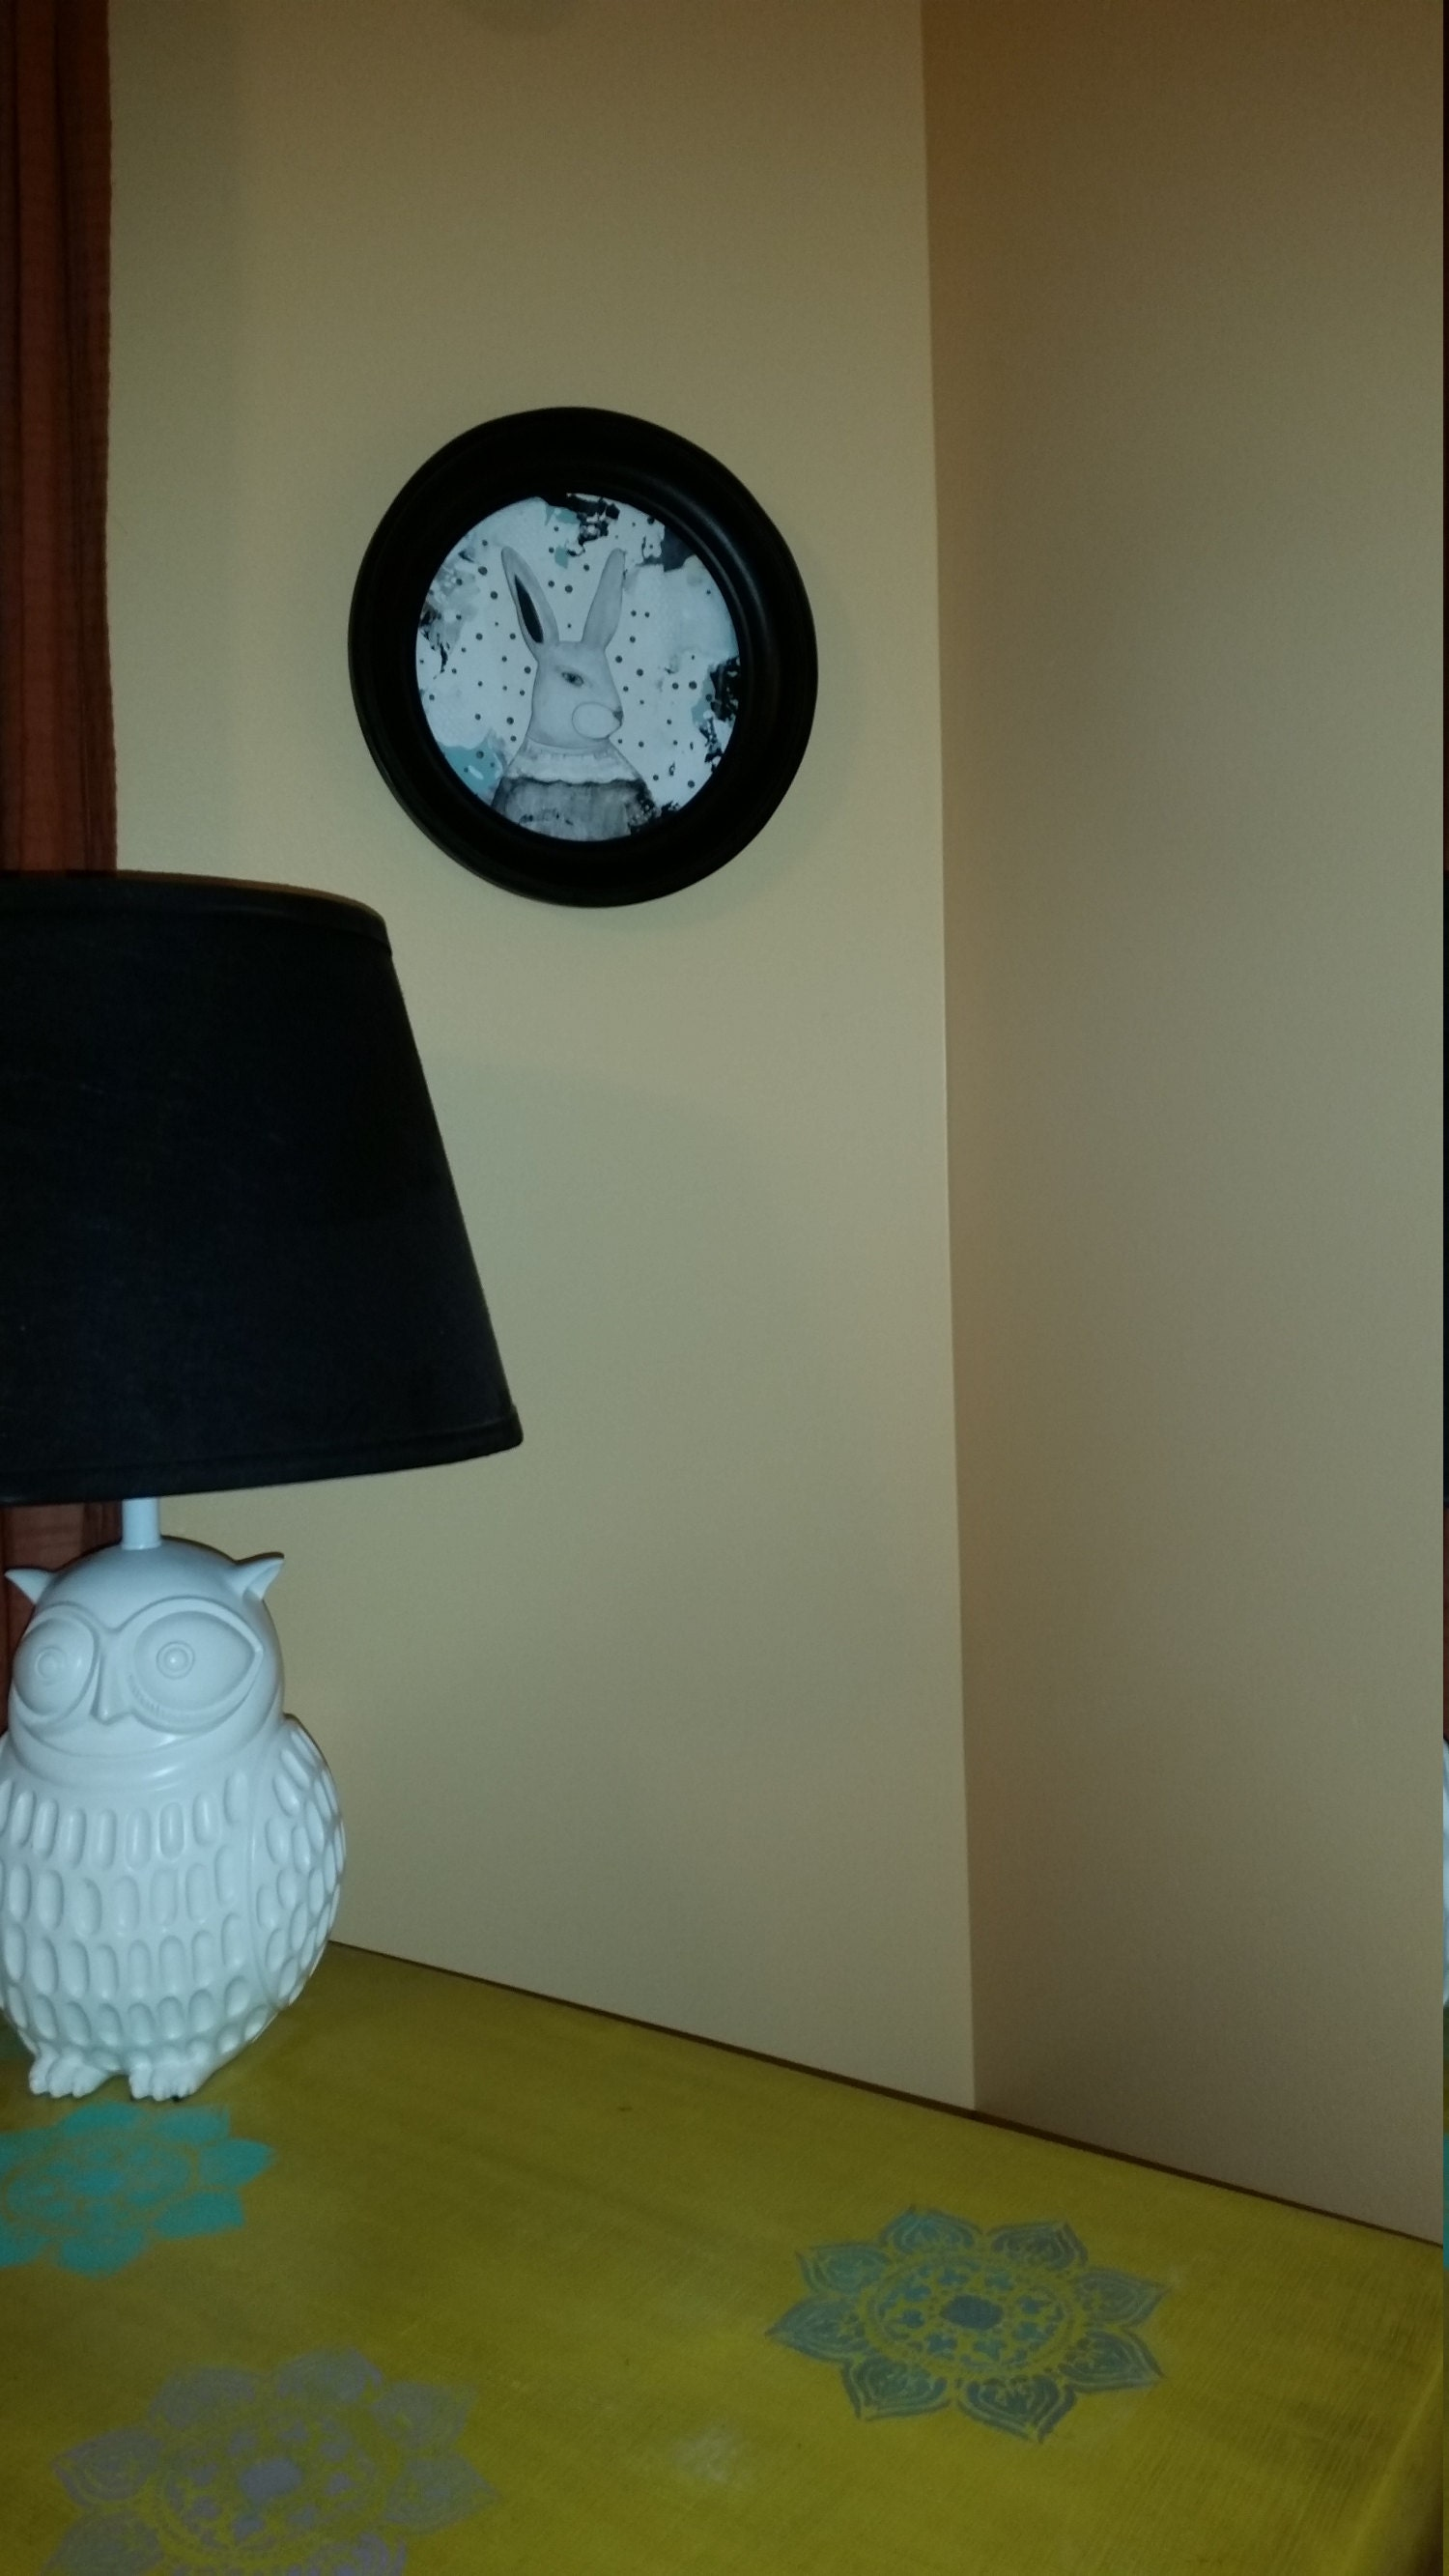 alejandra ferrucci added a photo of their purchase